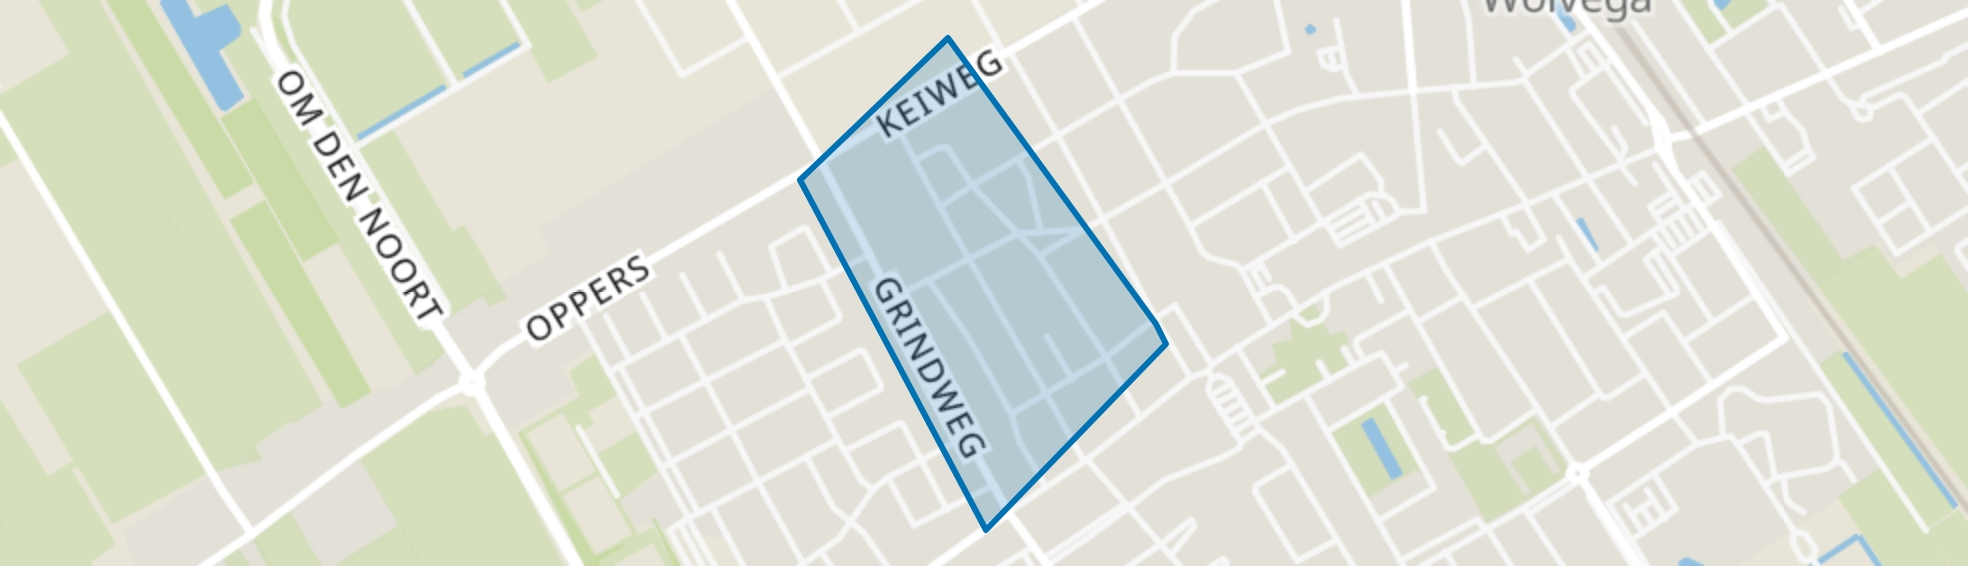 Wolvega-Vogelbuurt, Wolvega map